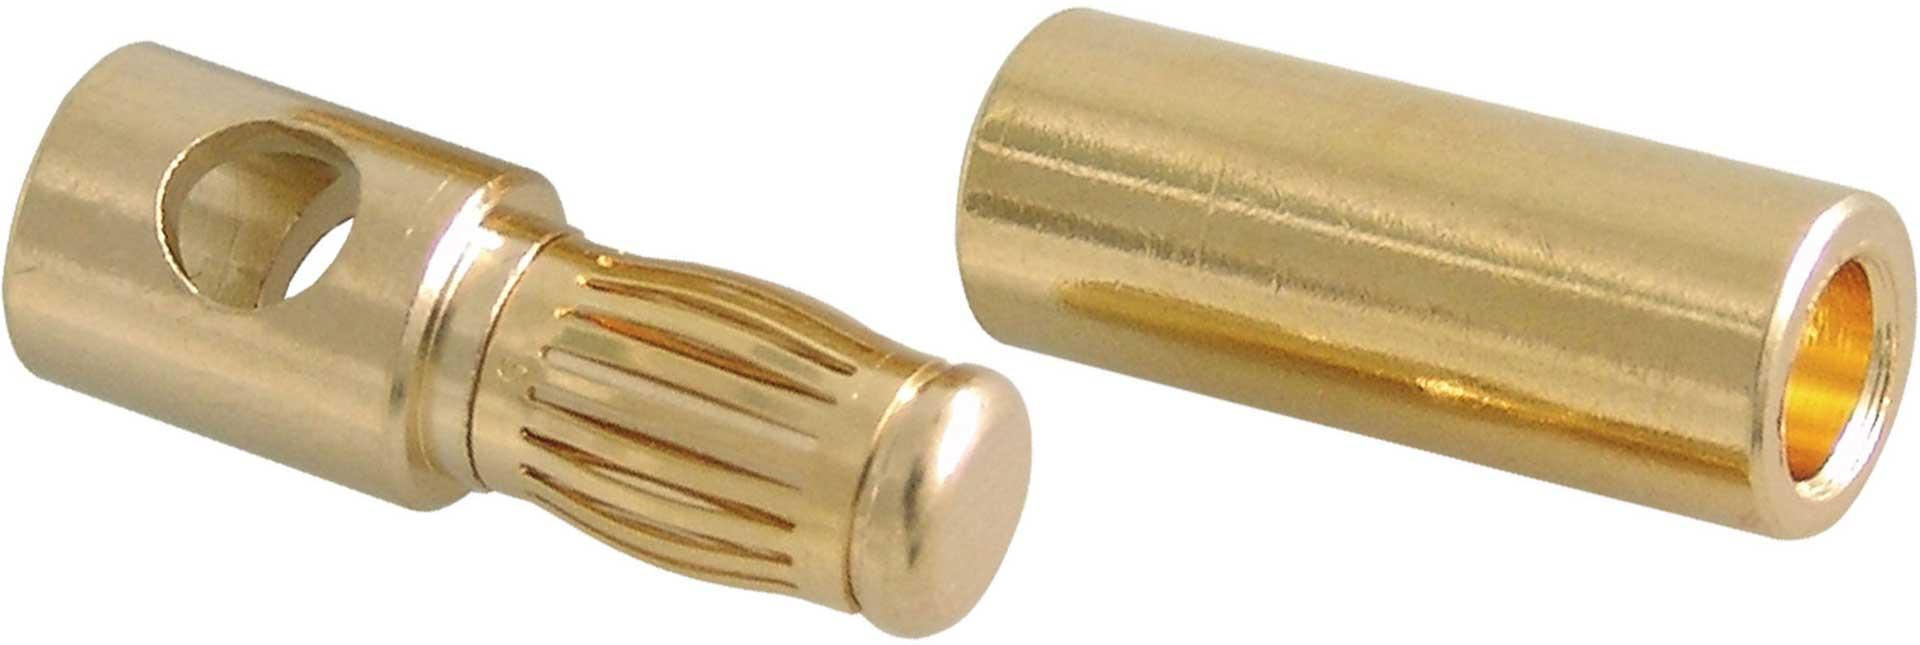 MODELLBAU LINDINGER GOLDKONTAKT-STECKER 5,4MM PROFI 1 PAAR